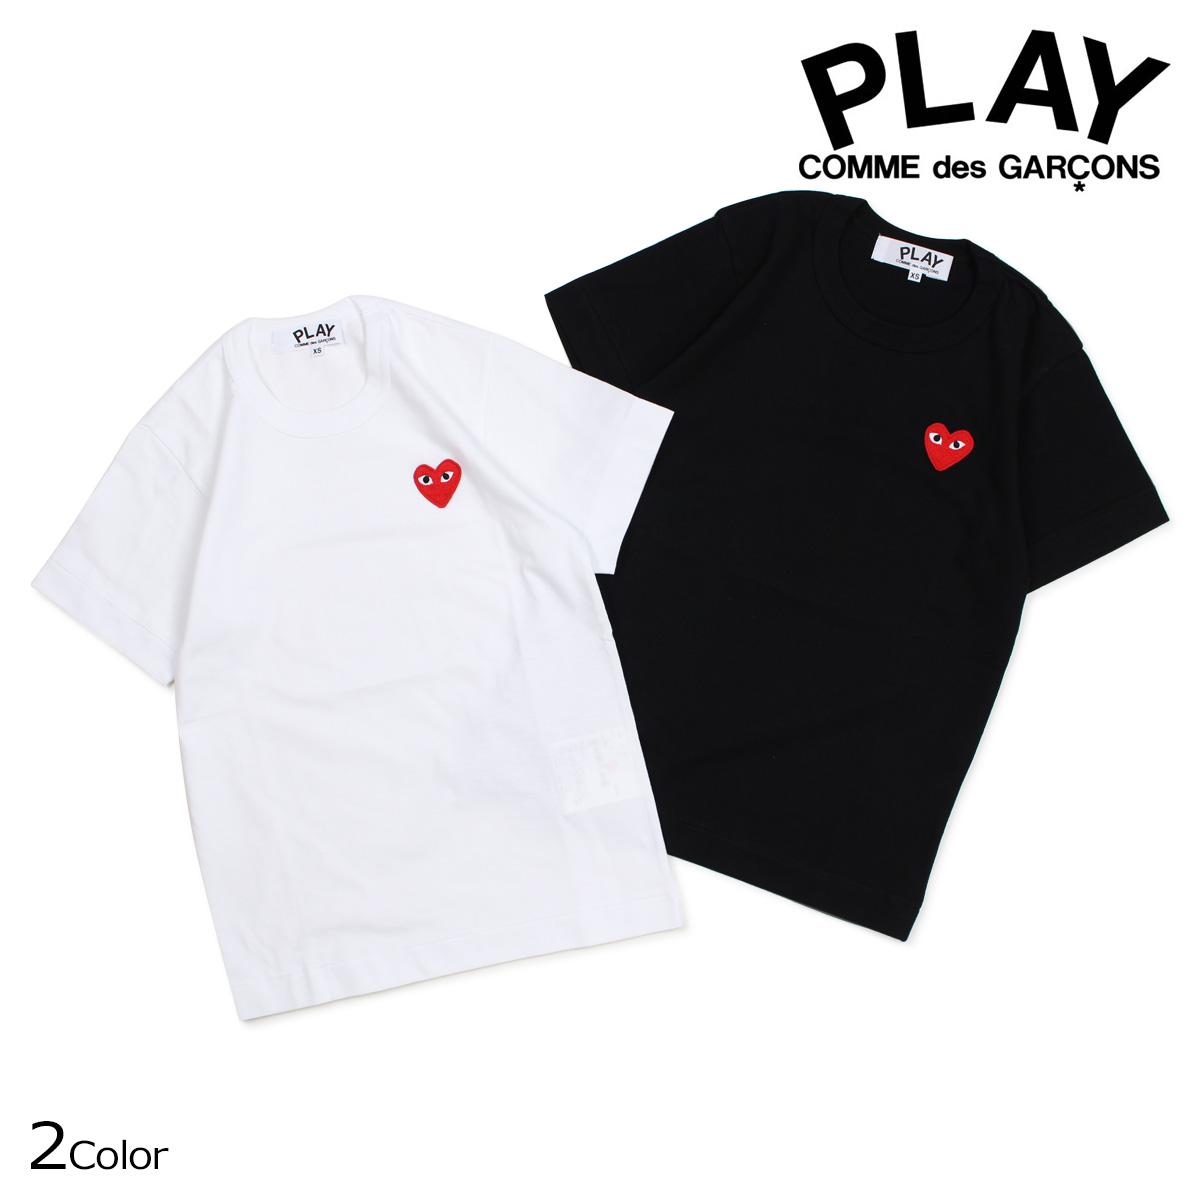 PLAY COMME des GARCONS RED HEART T-SHIRT コムデギャルソン Tシャツ 半袖 レディース ブラック ホワイト AZT107